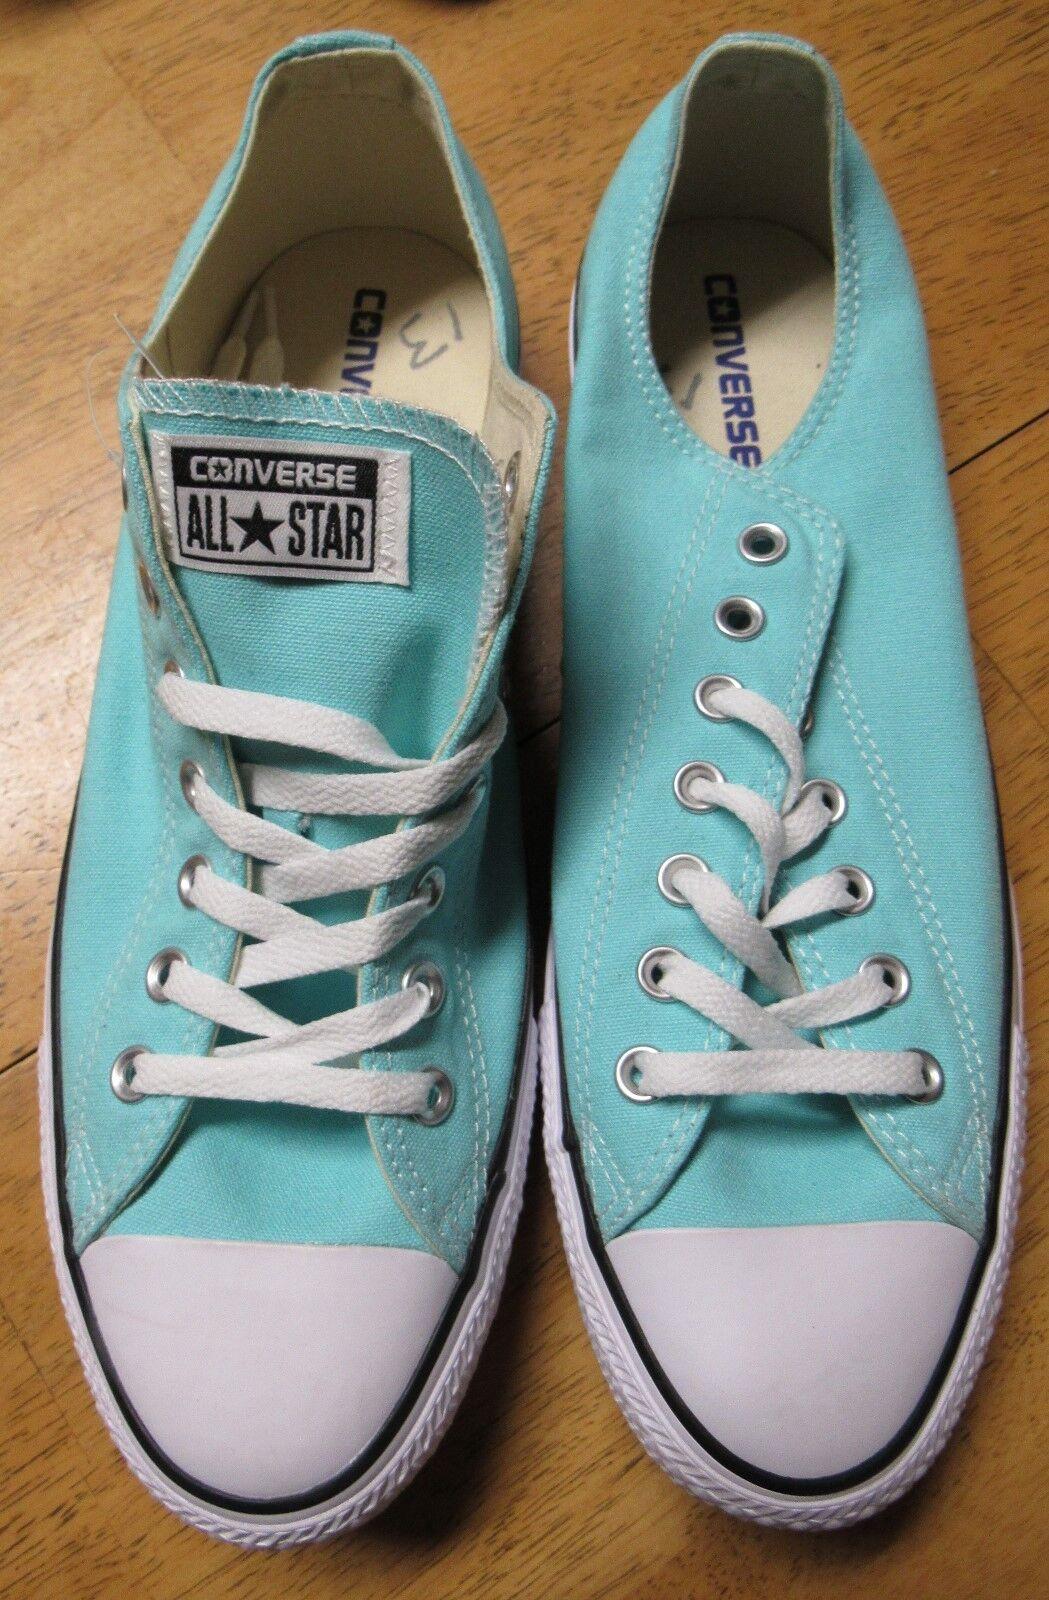 NEW Converse Chuck Taylor All Shoes Star Aruba Blue 130118F Shoes All Size Men 11 Women 13 2502e9